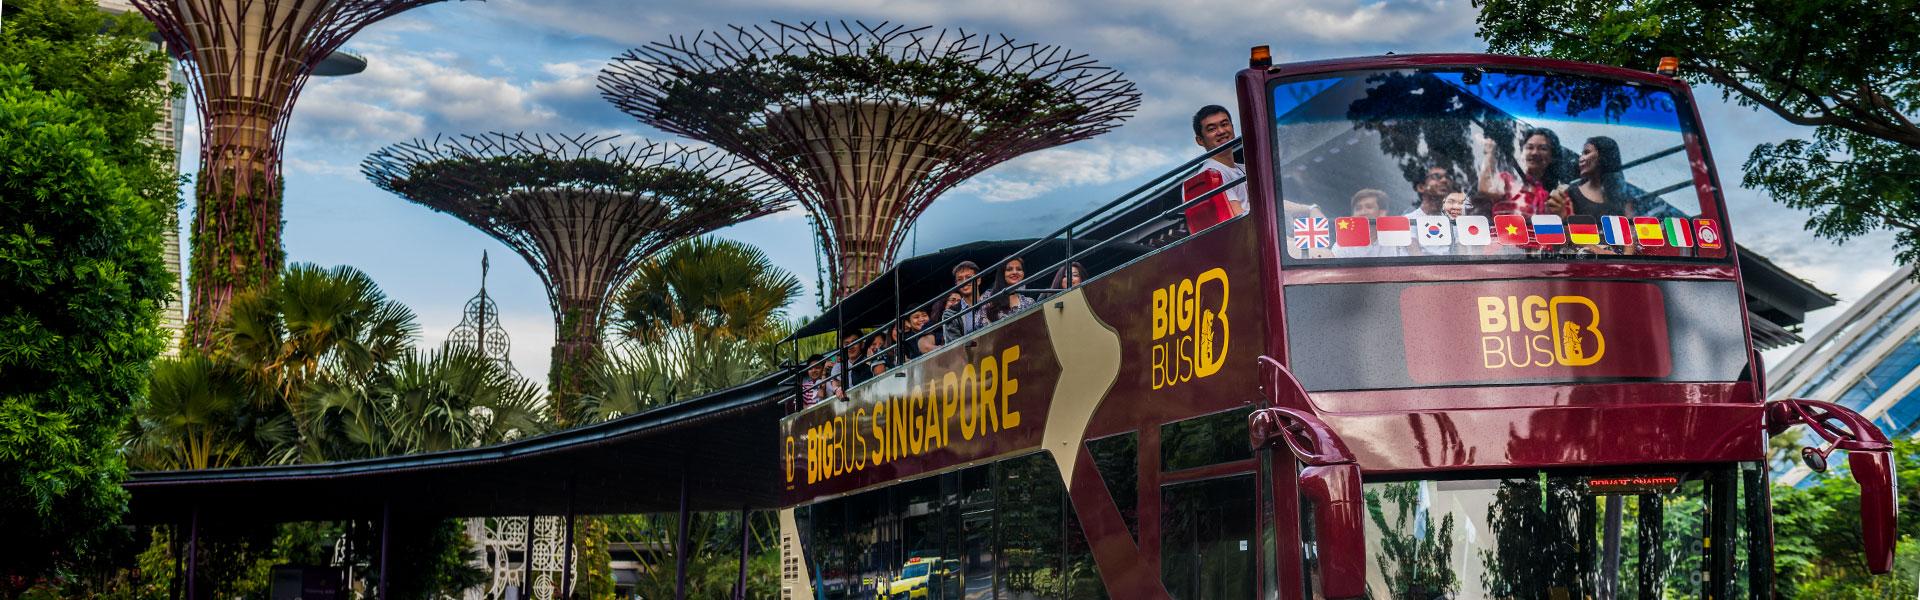 Big Bus Tours Singapore passing Super Trees